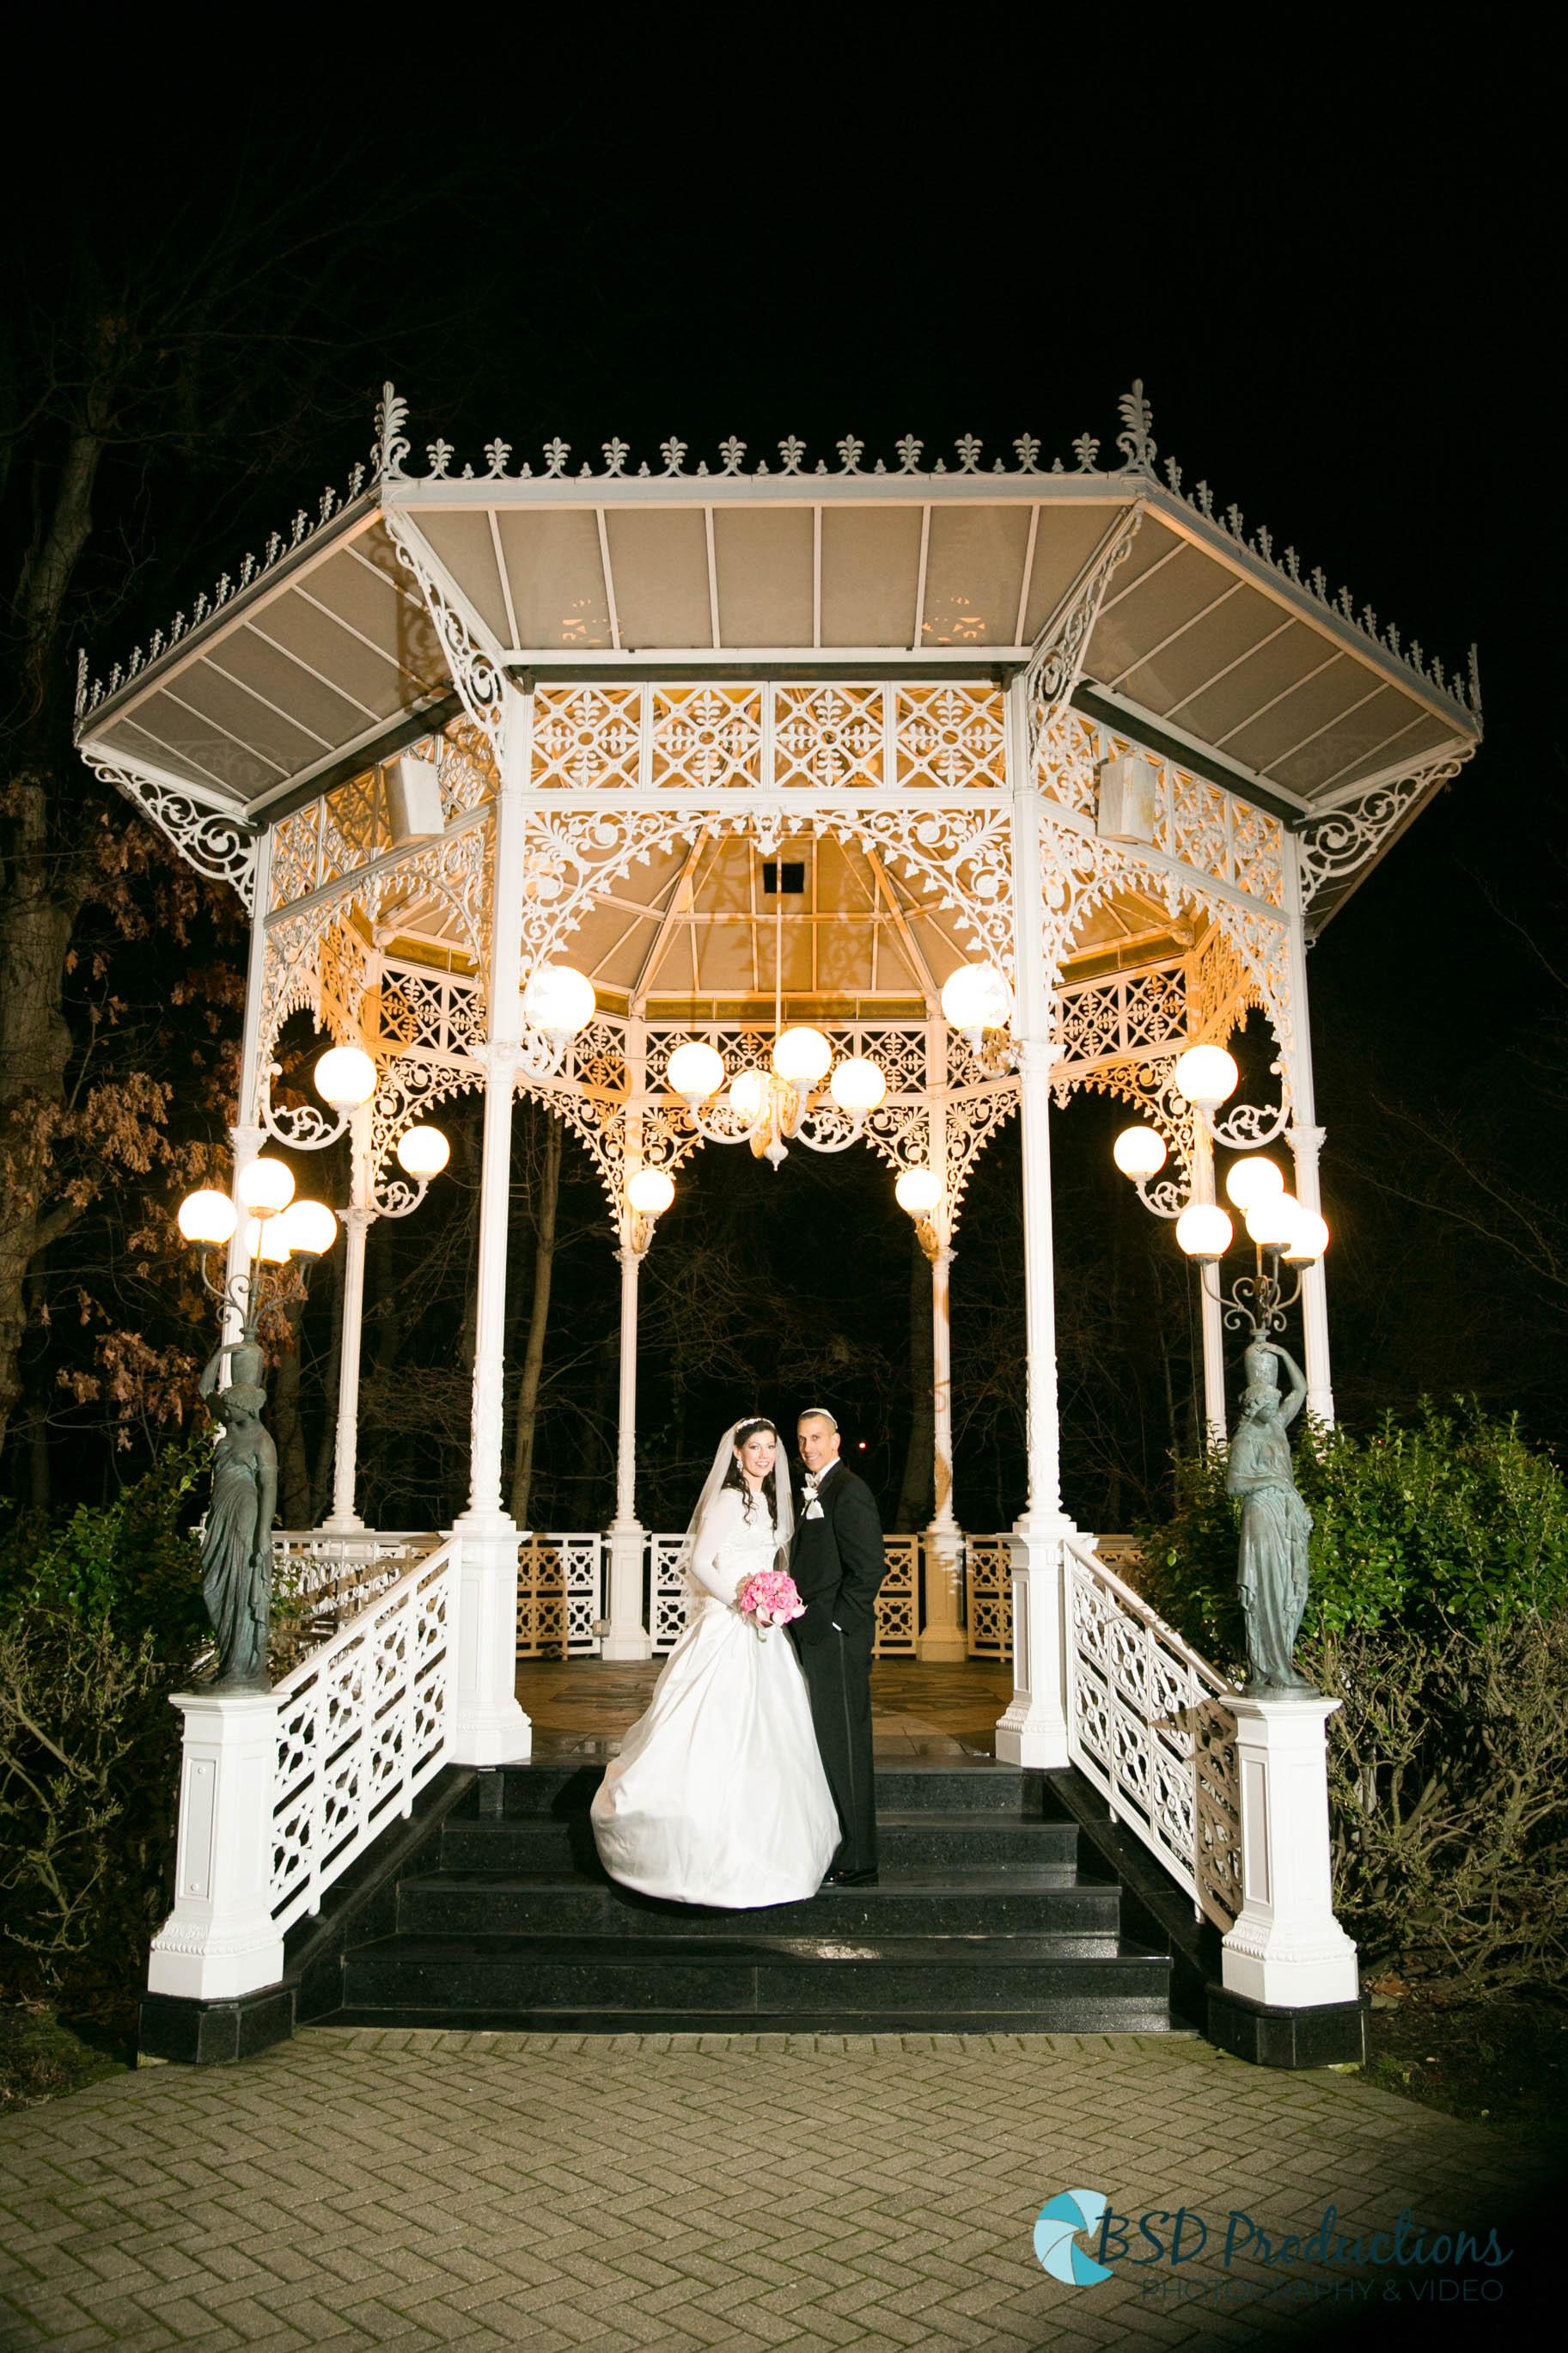 D_R_0055 Wedding – BSD Productions Photography